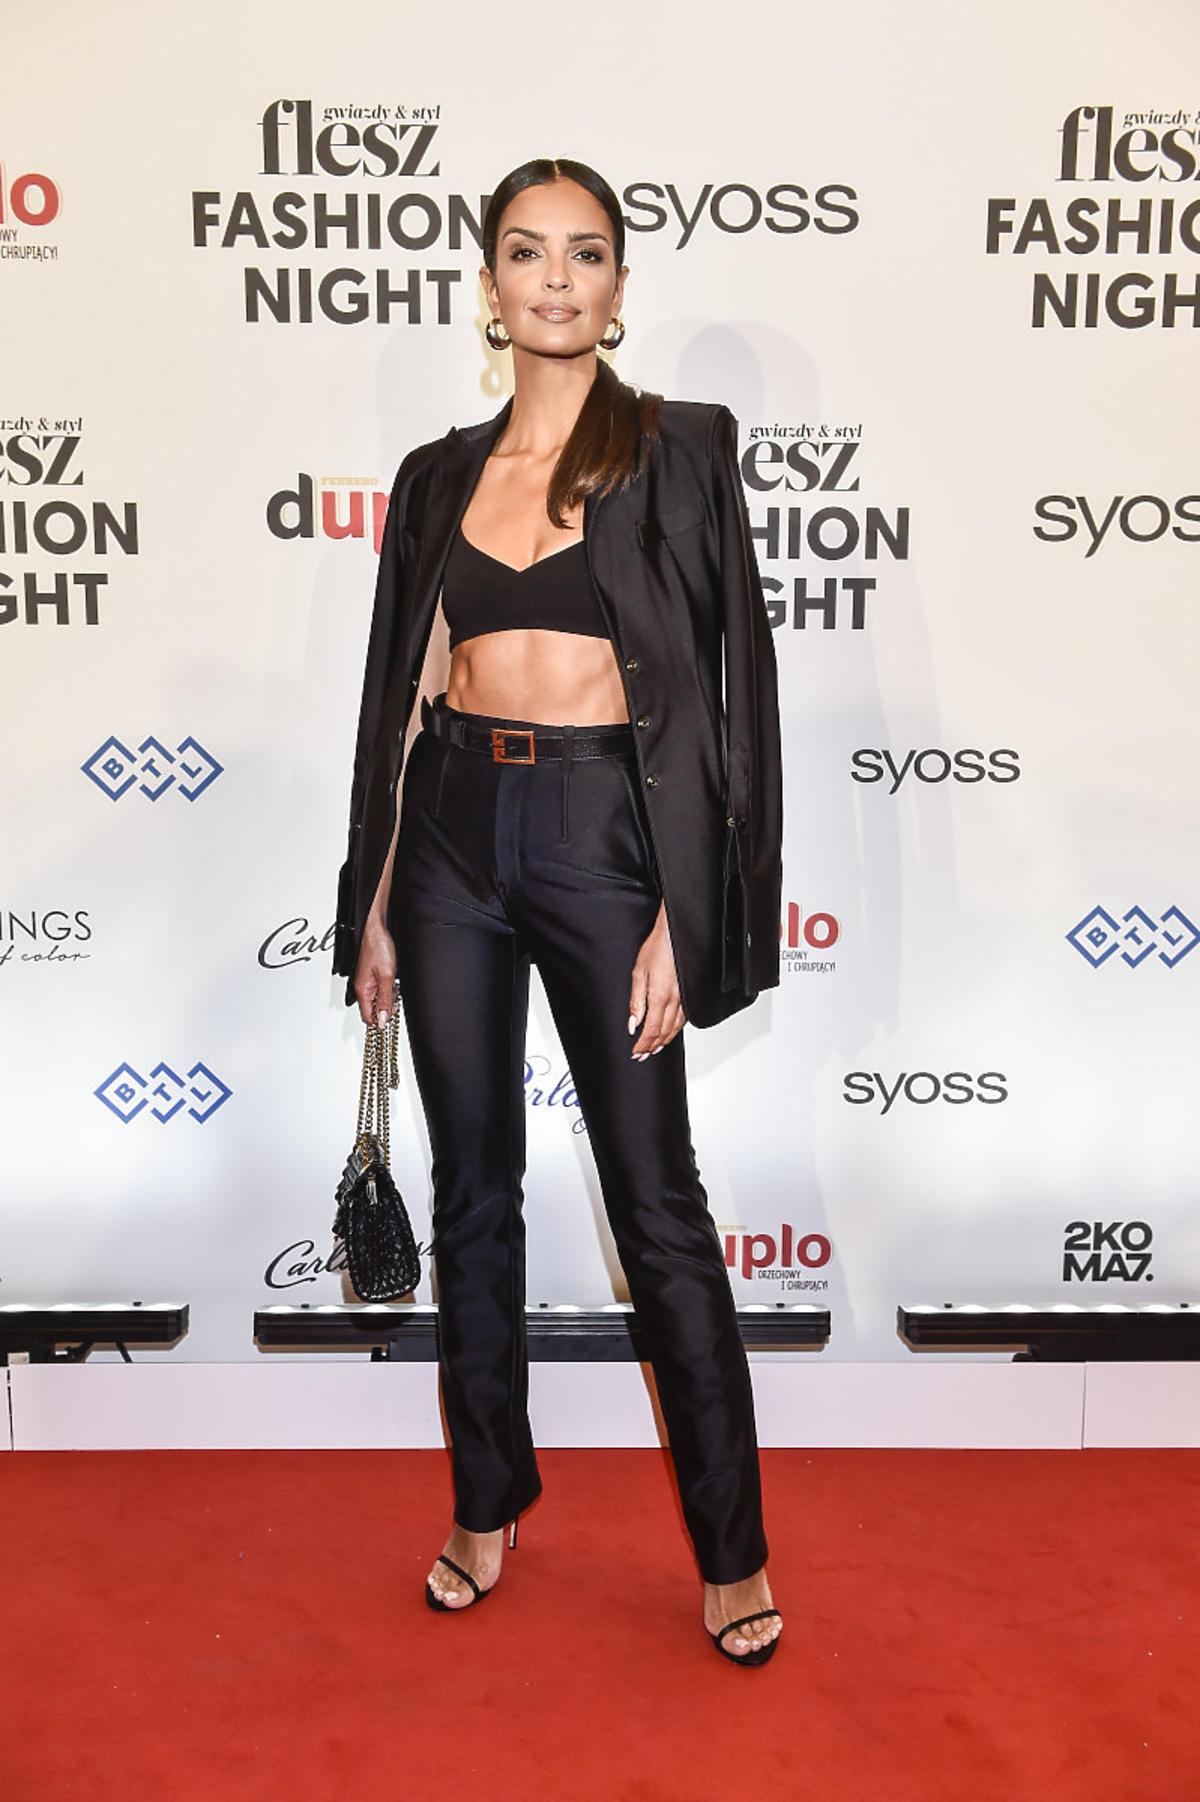 Klaudia El Dursi z Hotelu Paradise na Flesz Fashion Night